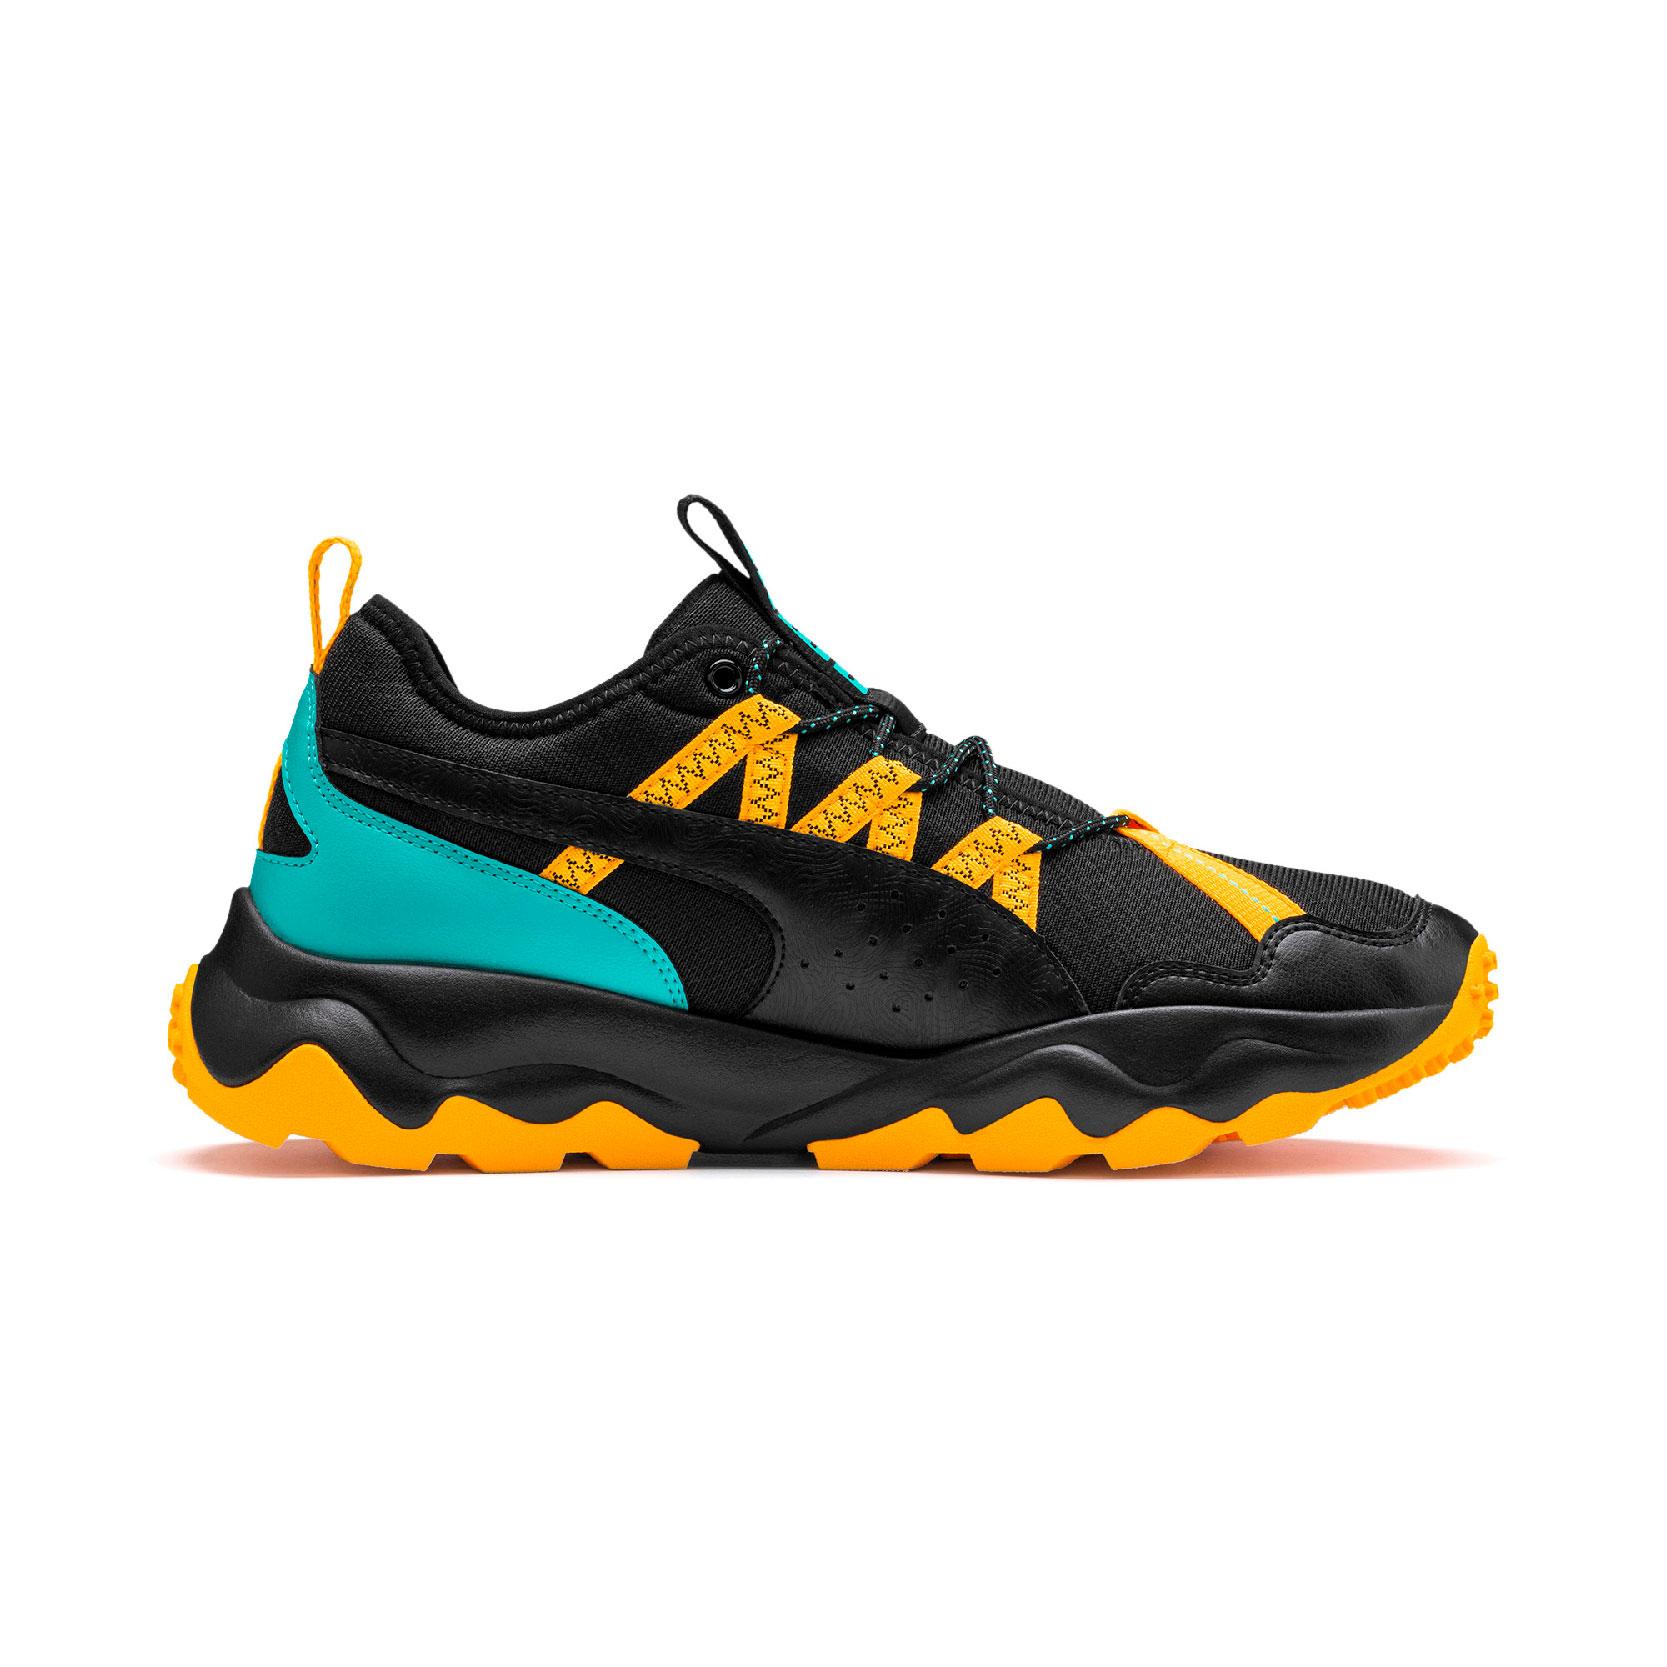 Puma Men's Ember TRL Running Shoes 1